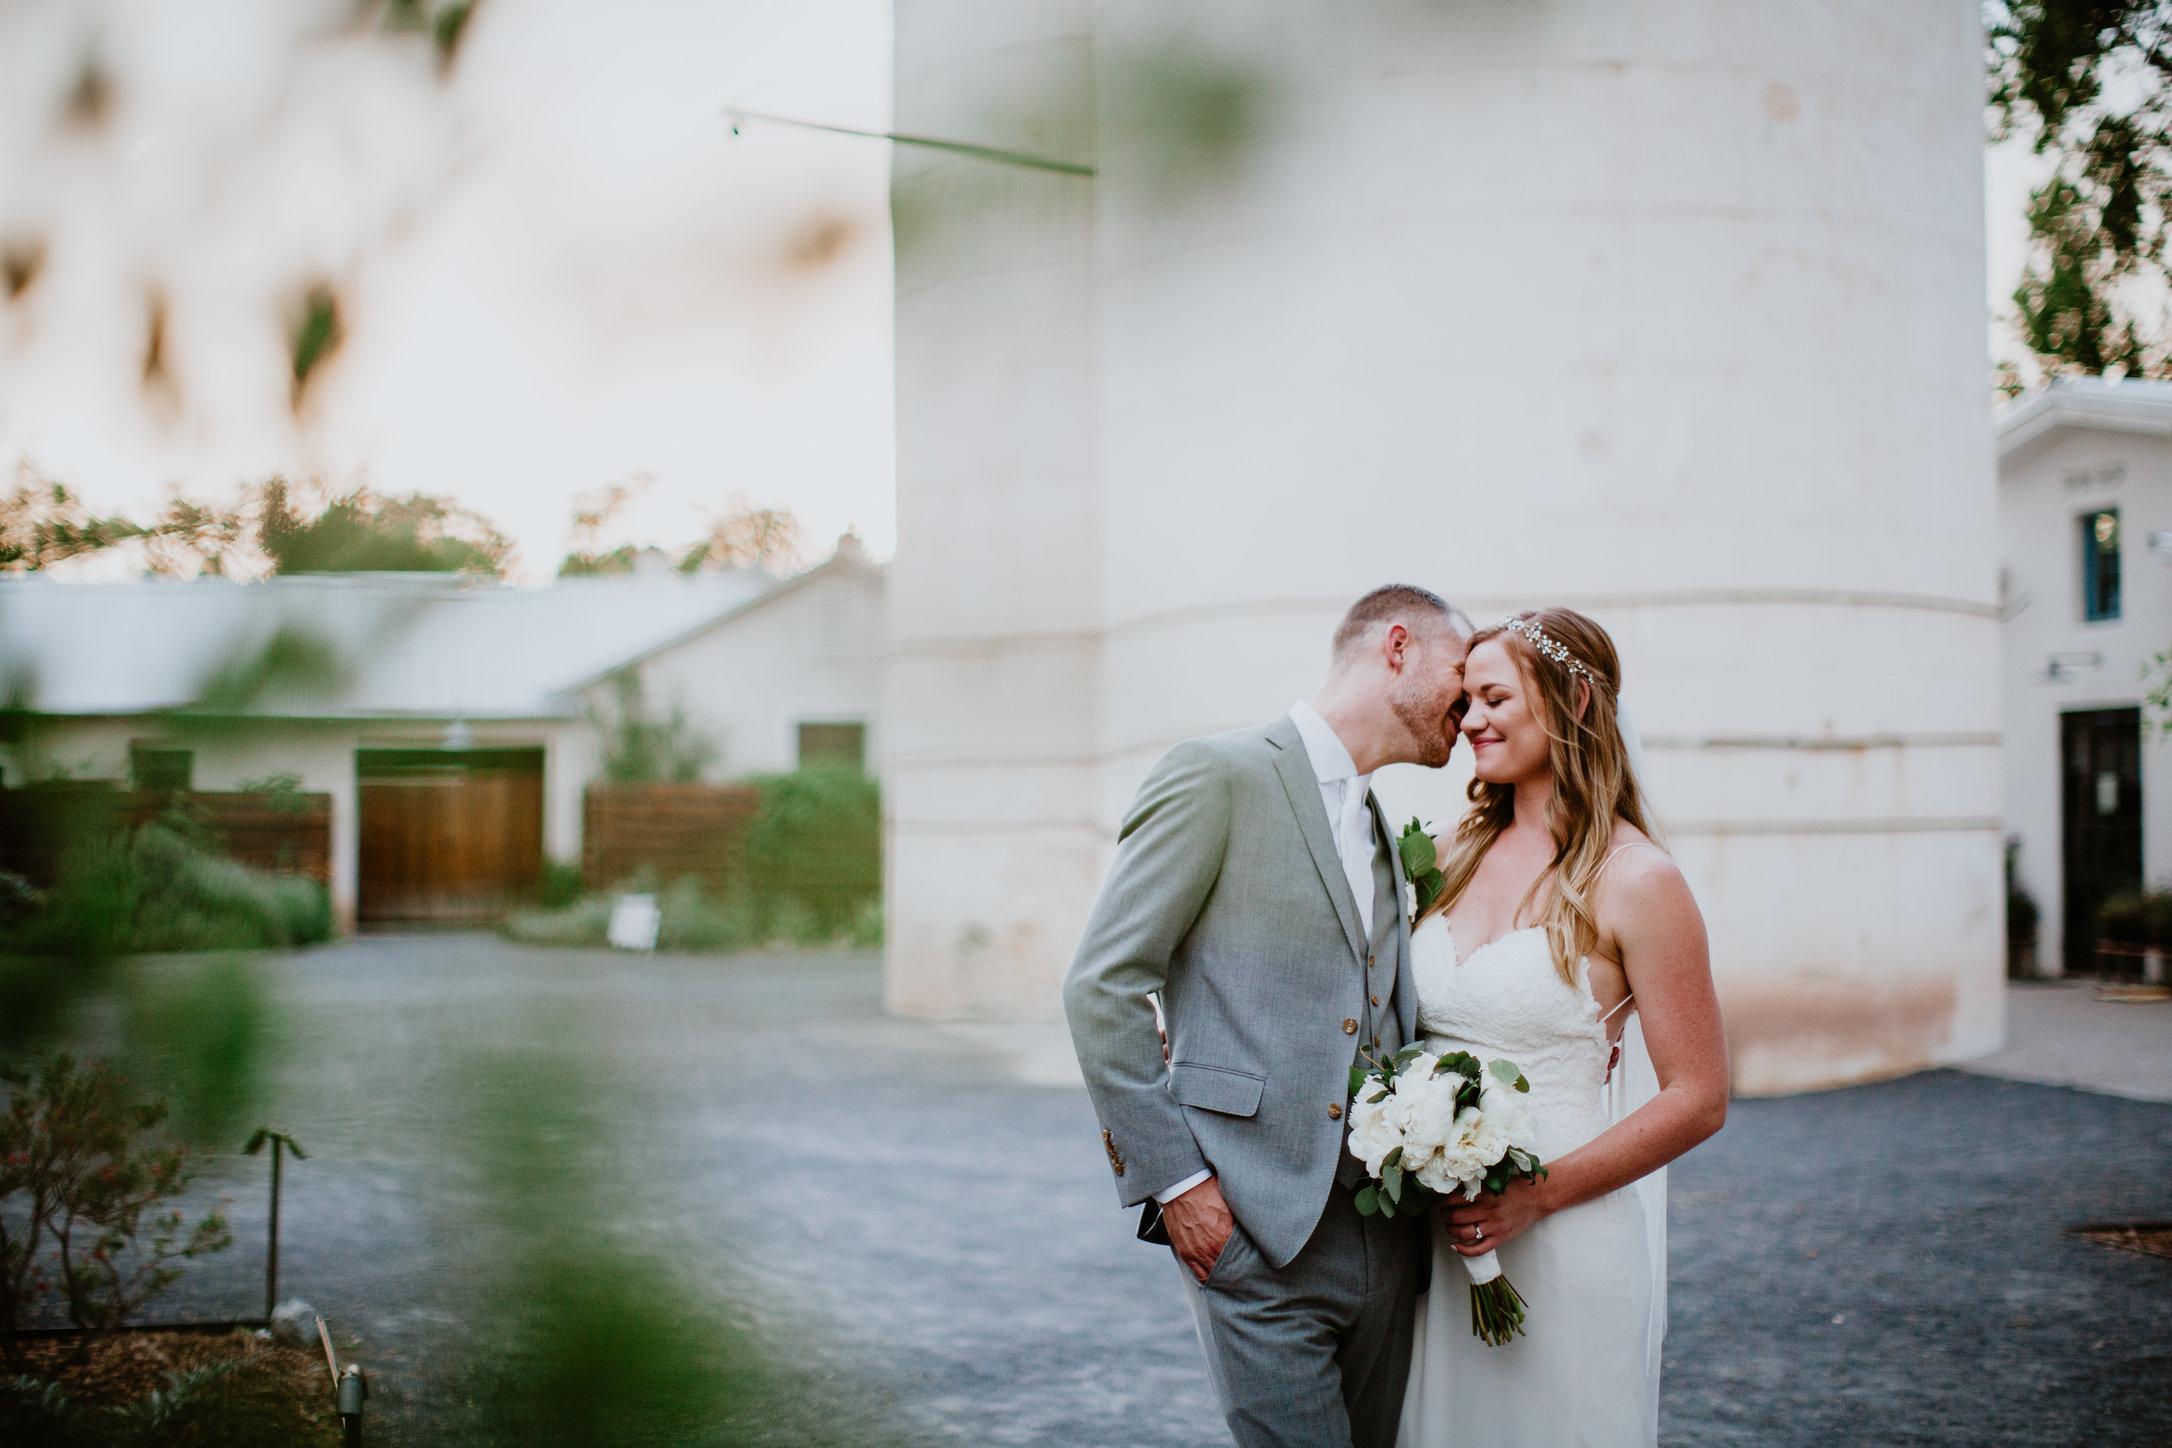 DandA-wedding-762.jpg